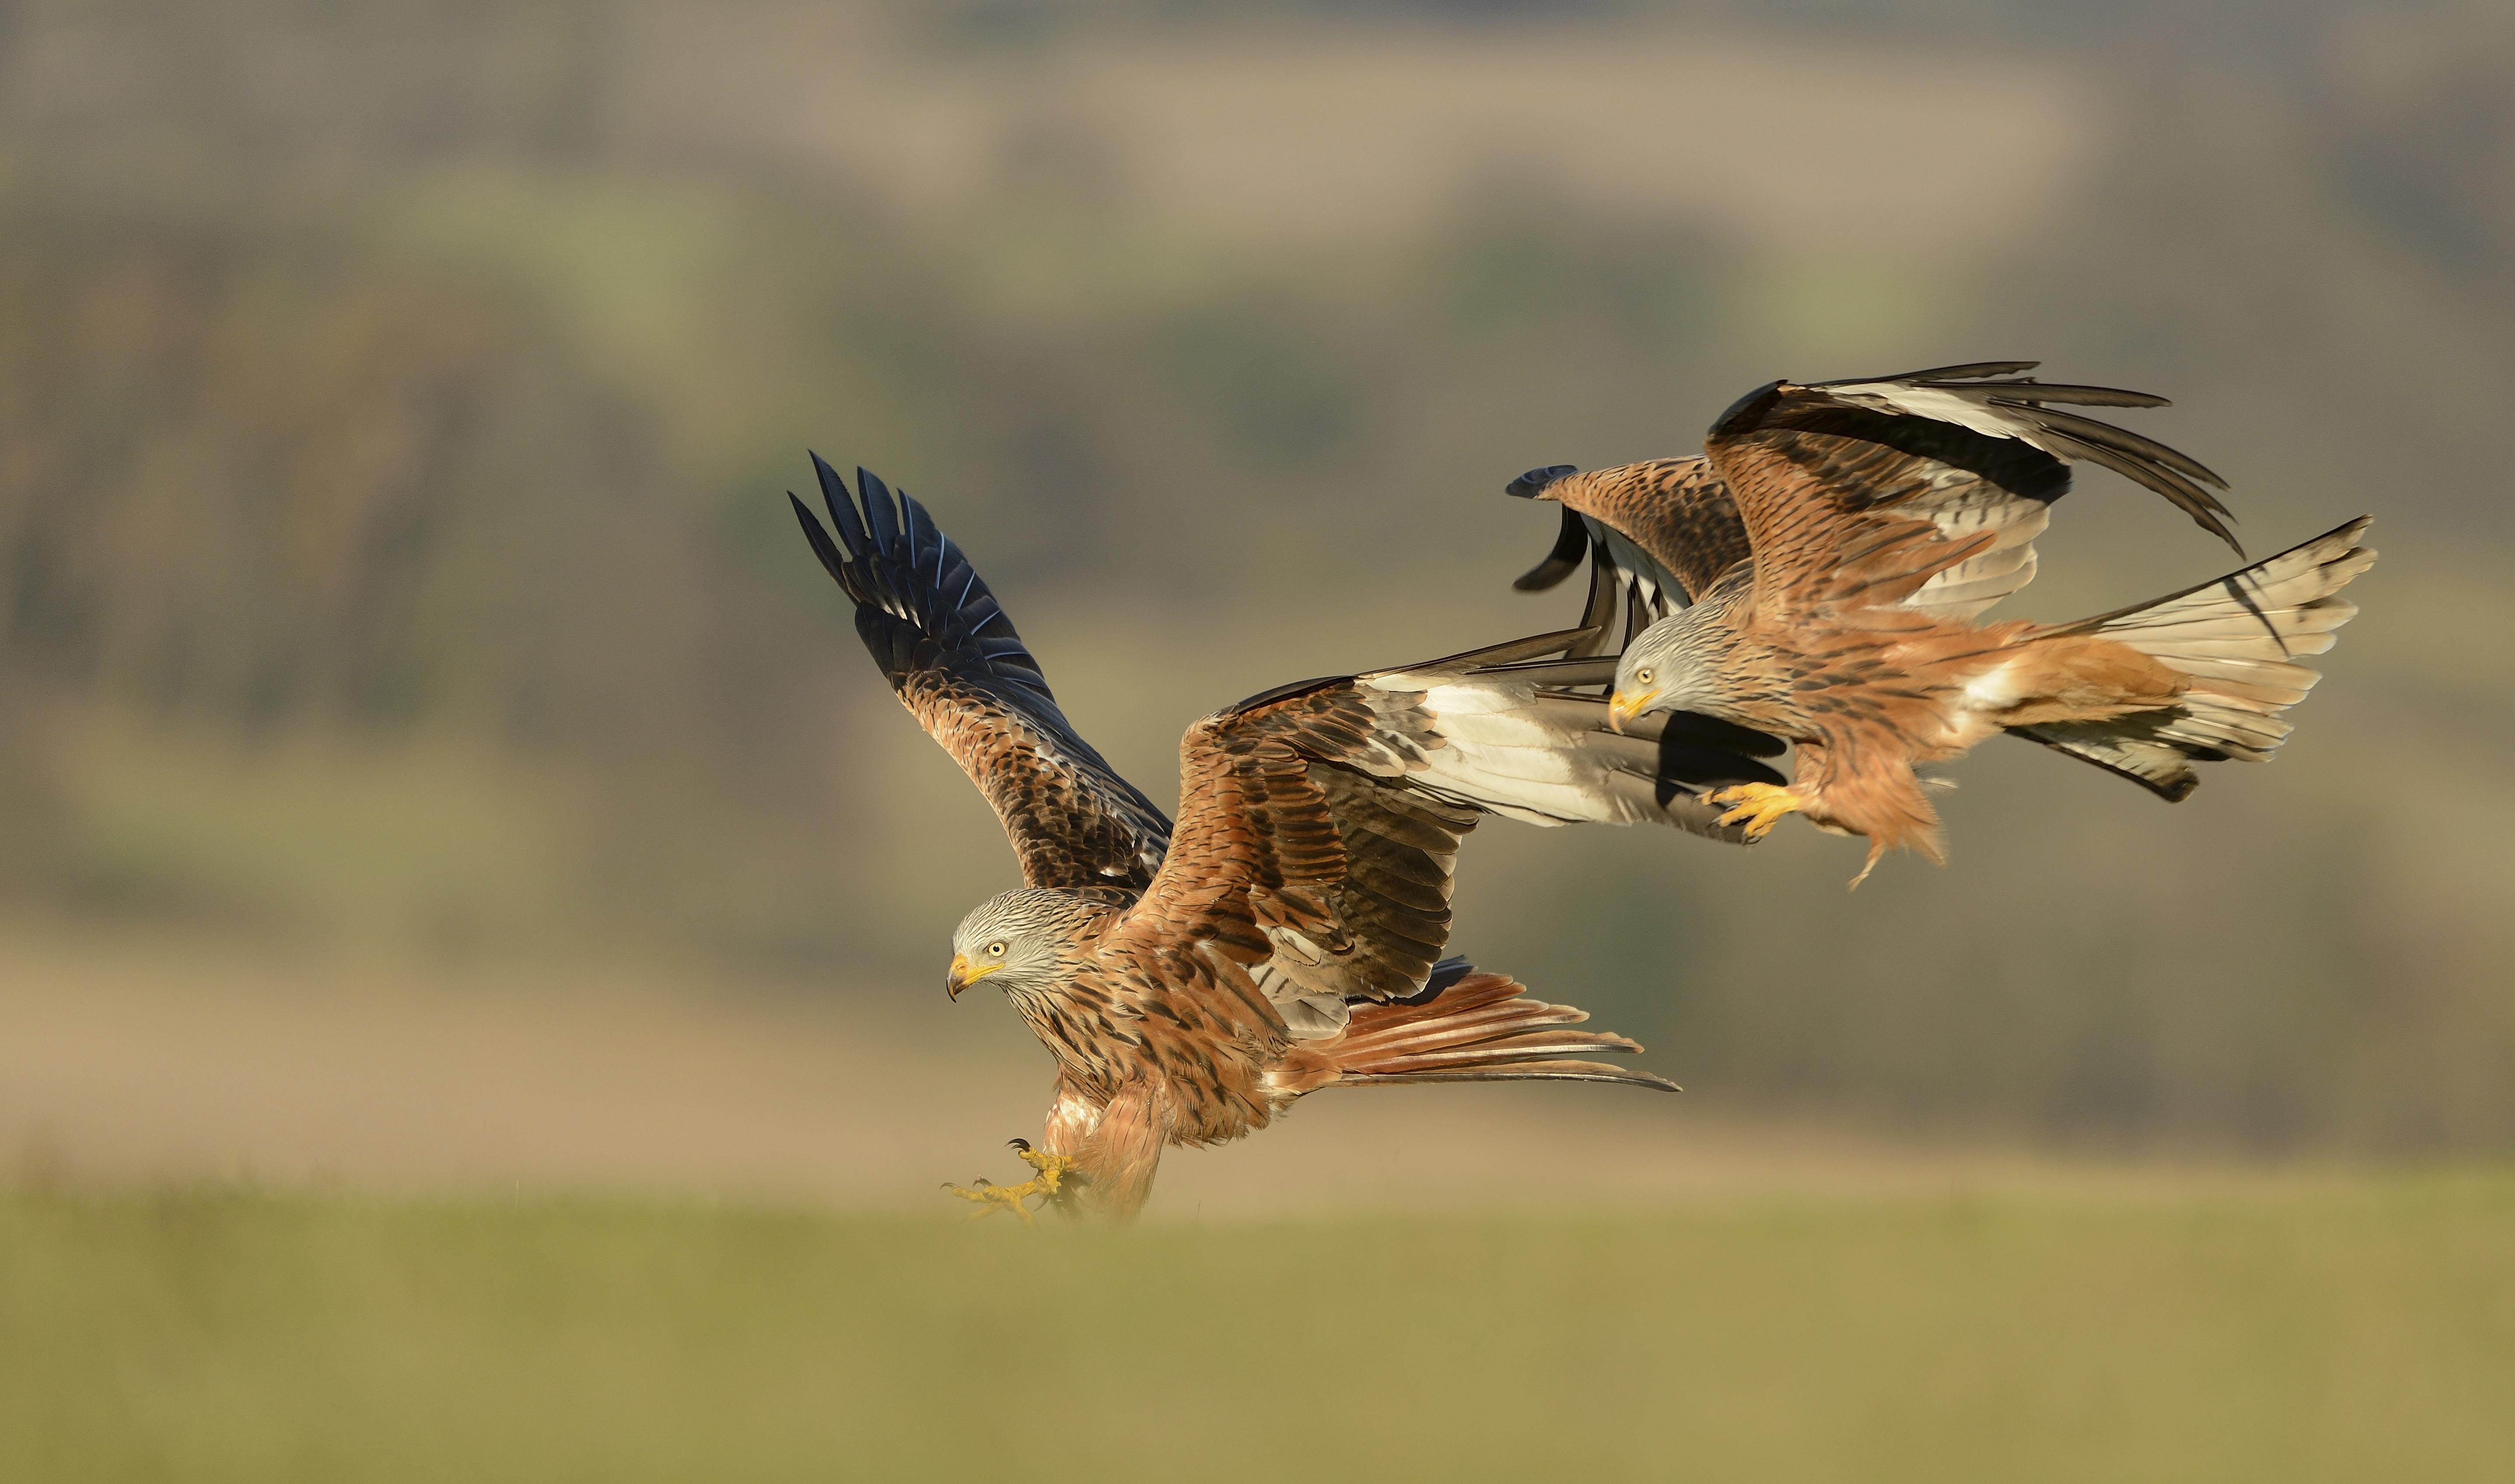 Red Kite Bird Facts | Milvus Milvus - The RSPB